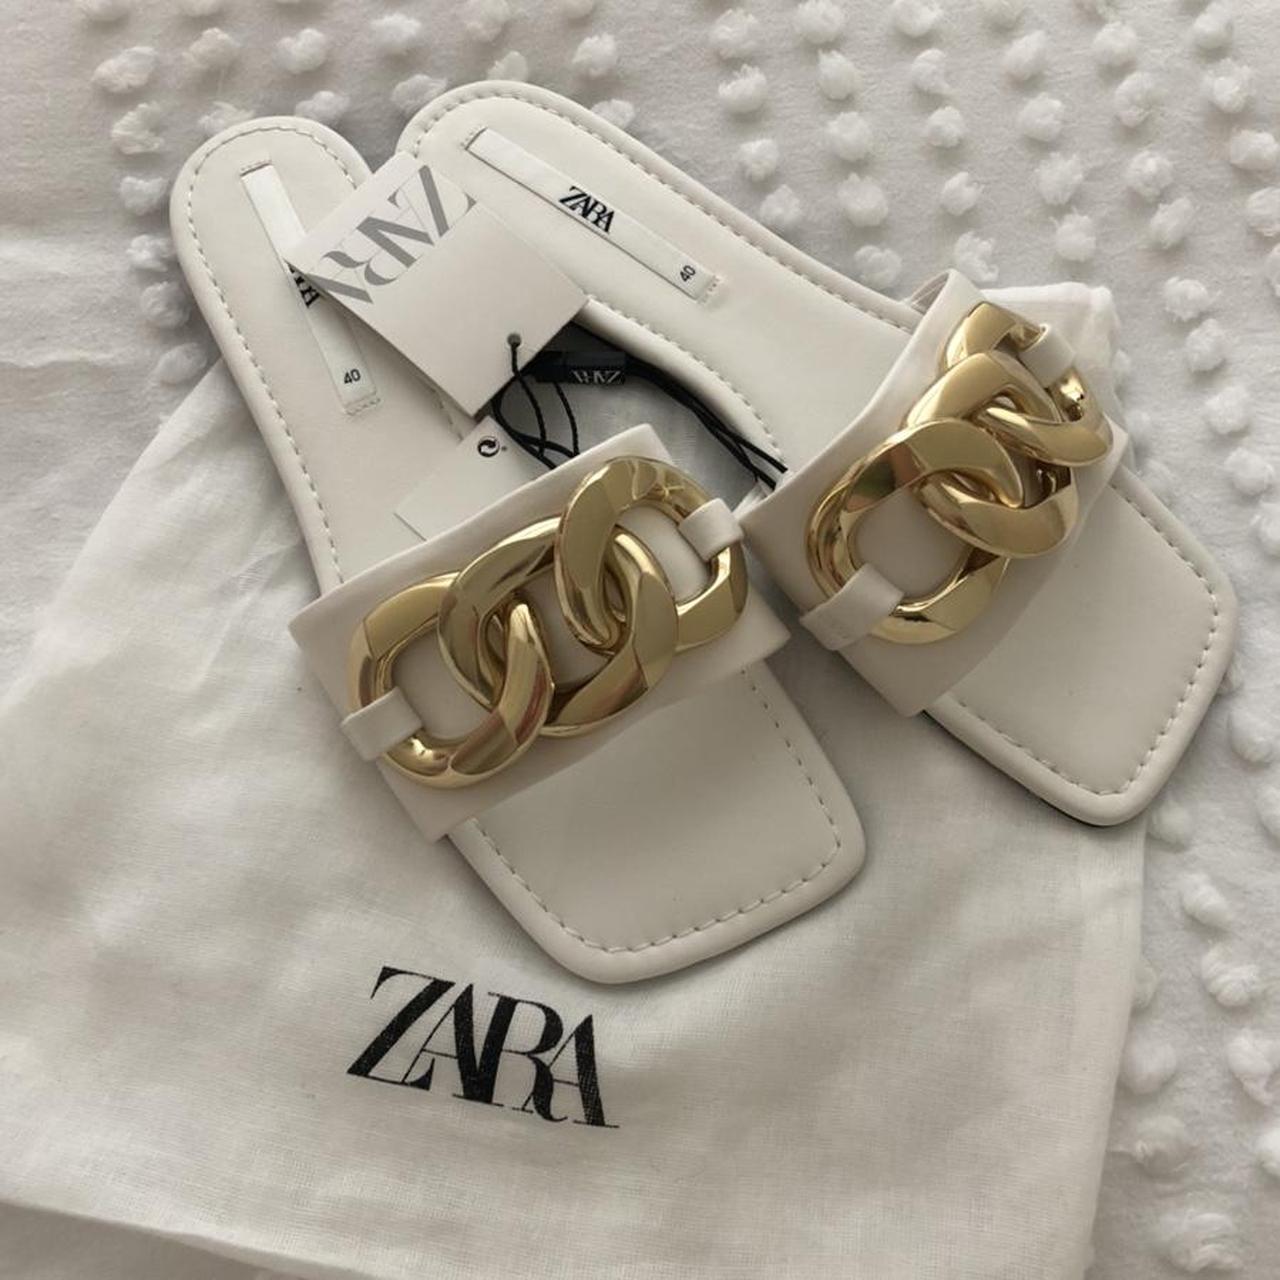 Product Image 1 - BRAND NEW white zara sandals